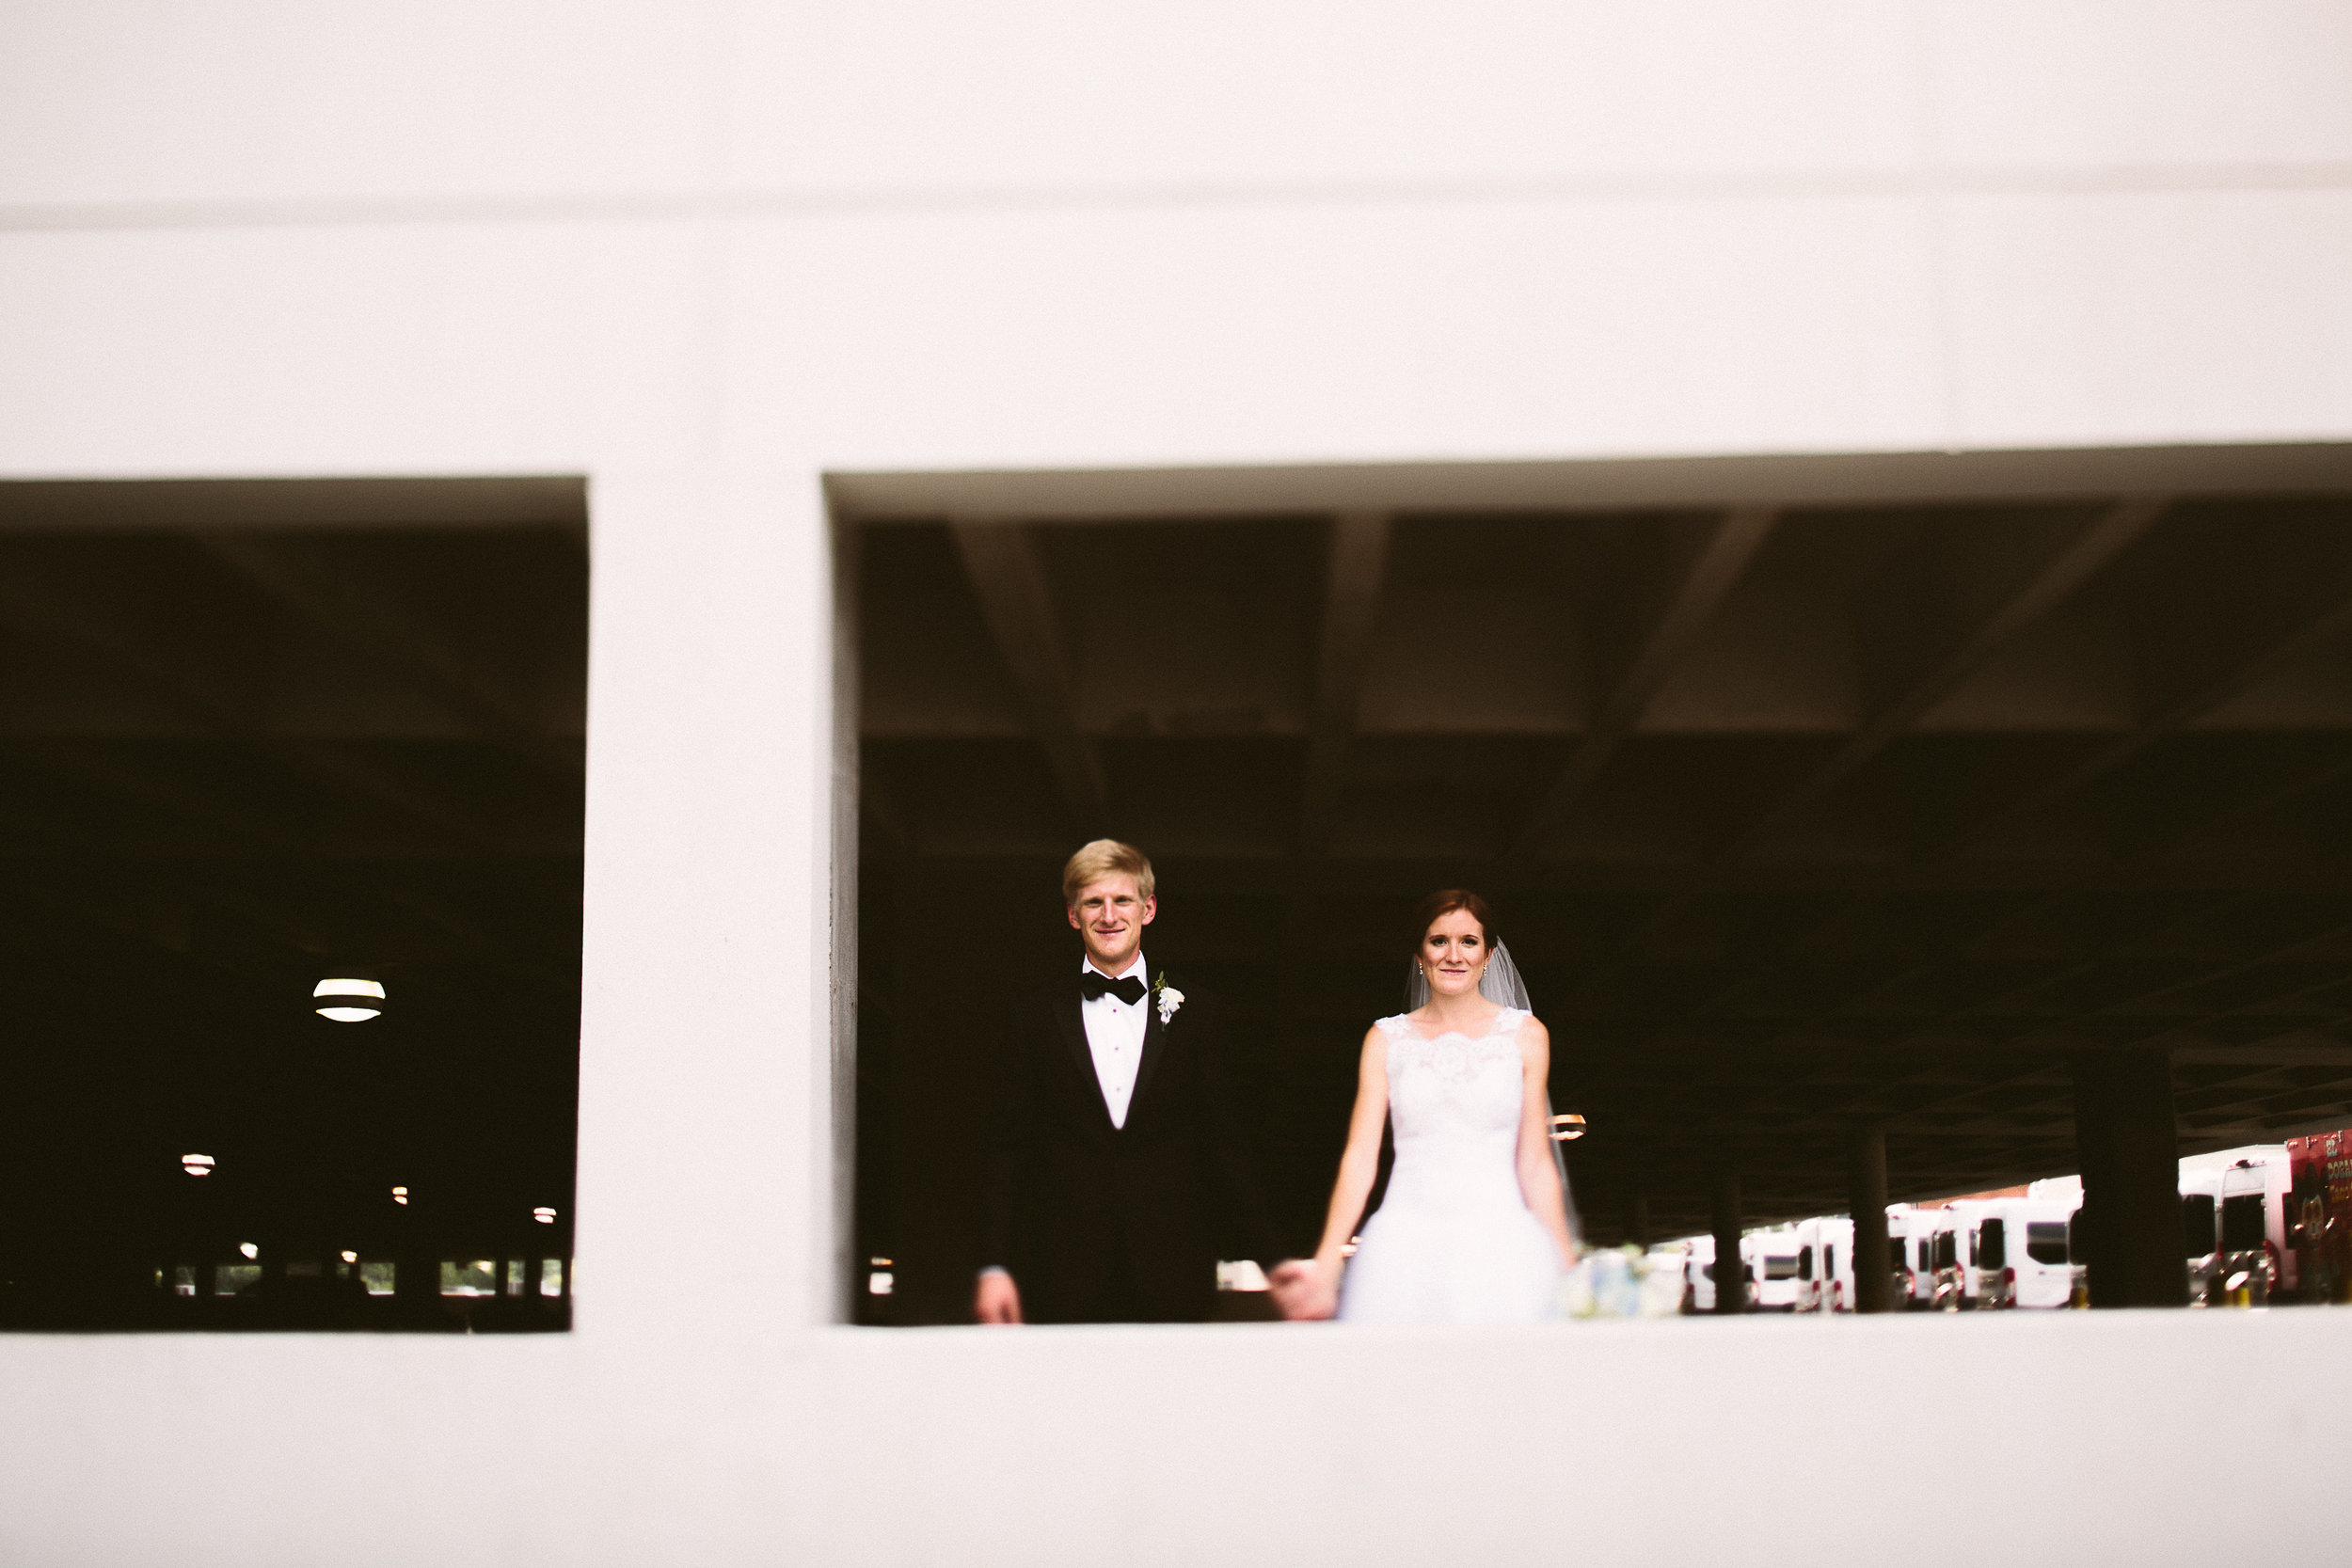 LINDSEY + JUSTIN WED HIGHLIGHTS-112.jpg